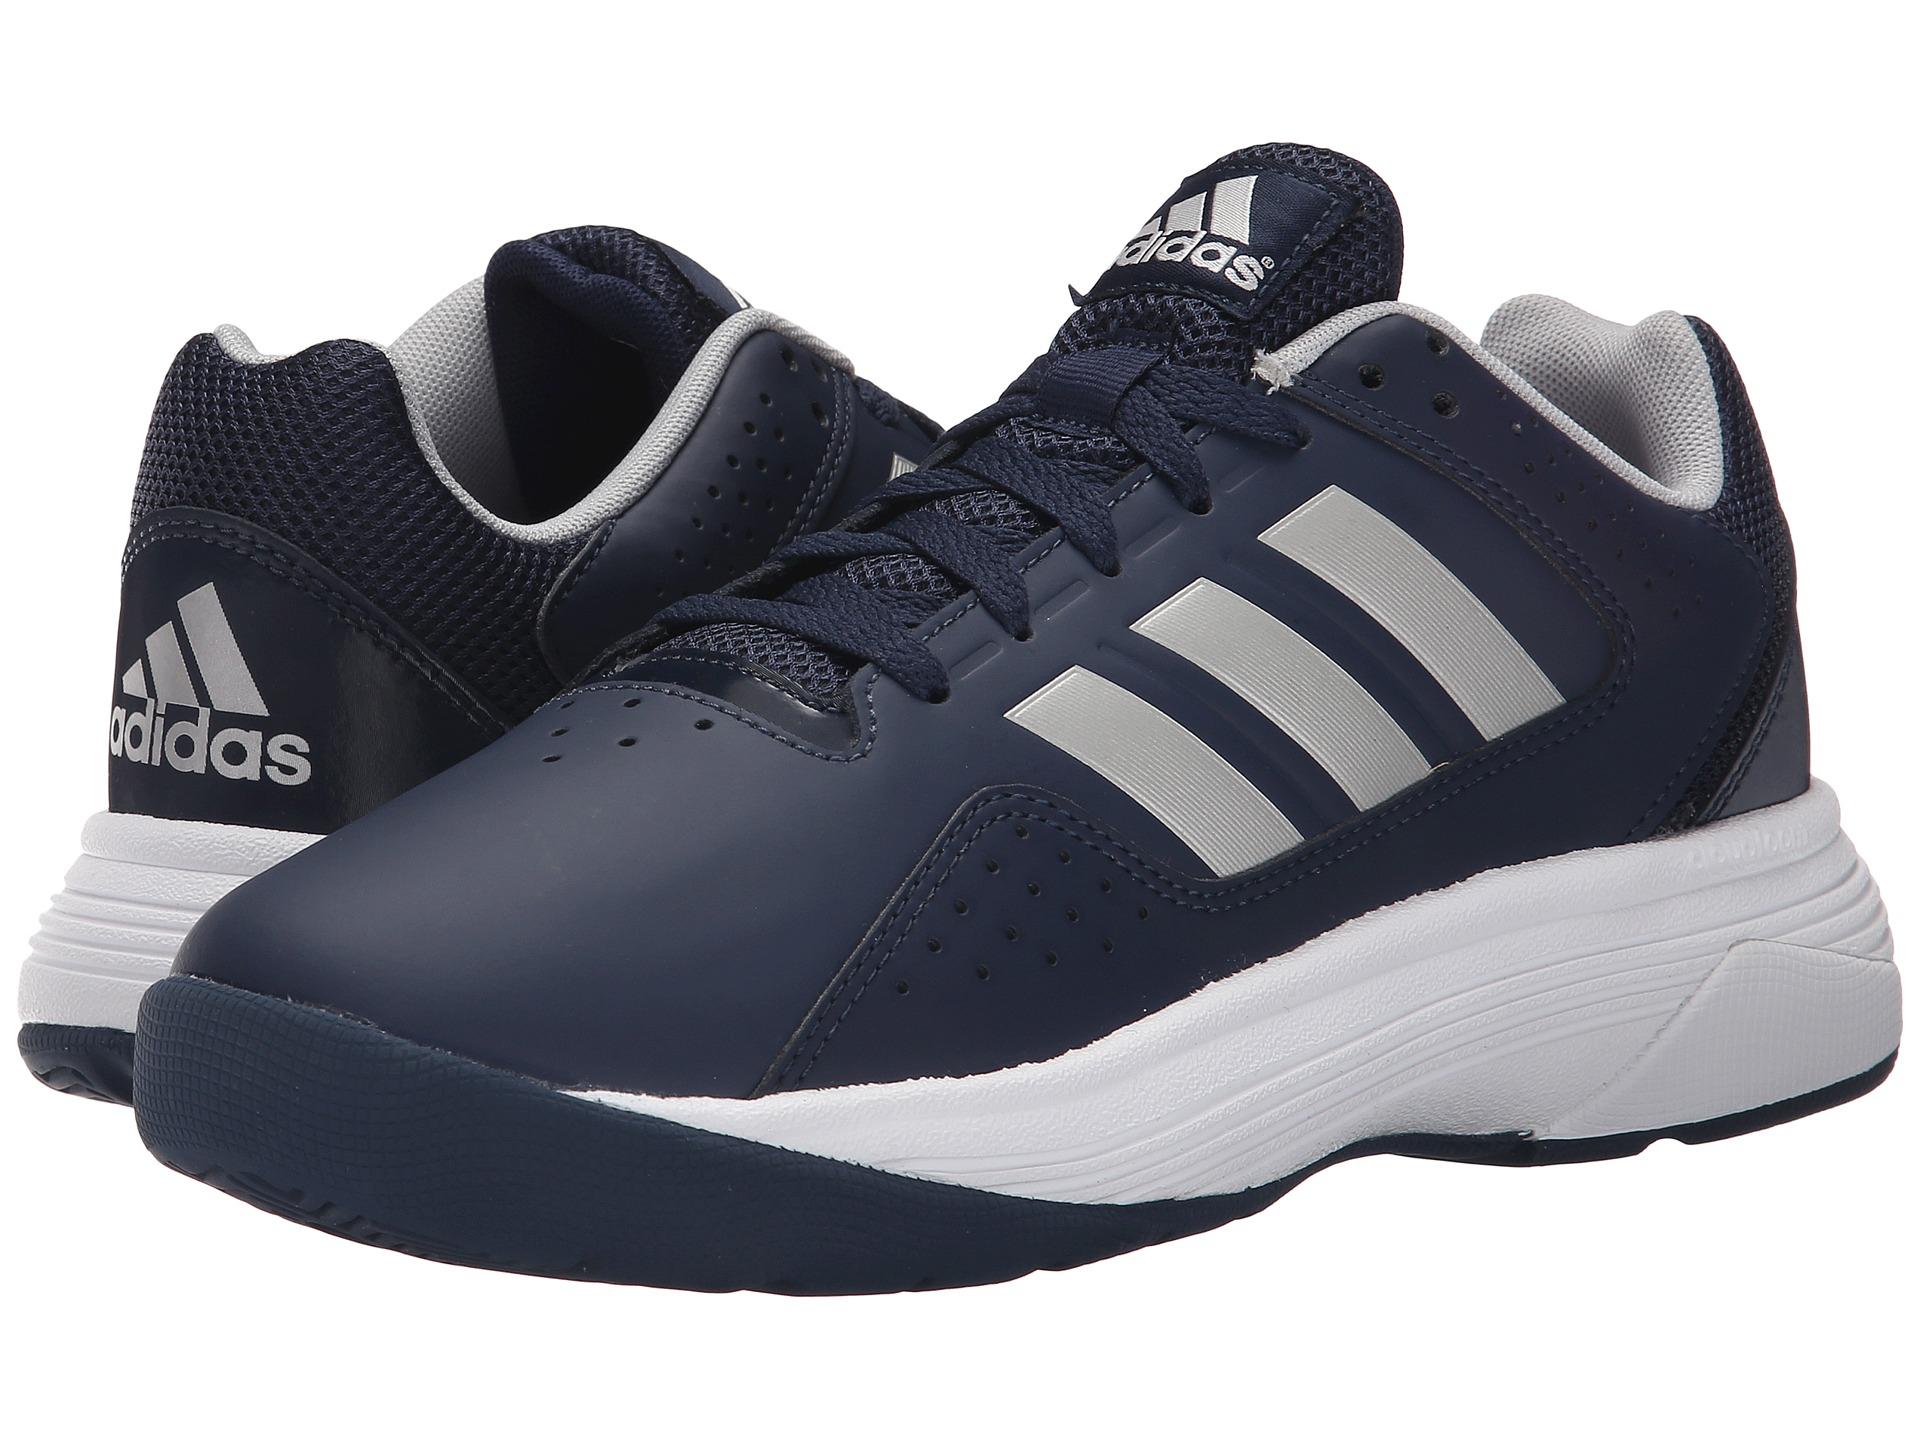 Adidas Originals Cloudfoam Ilation In Blue For Men Lyst